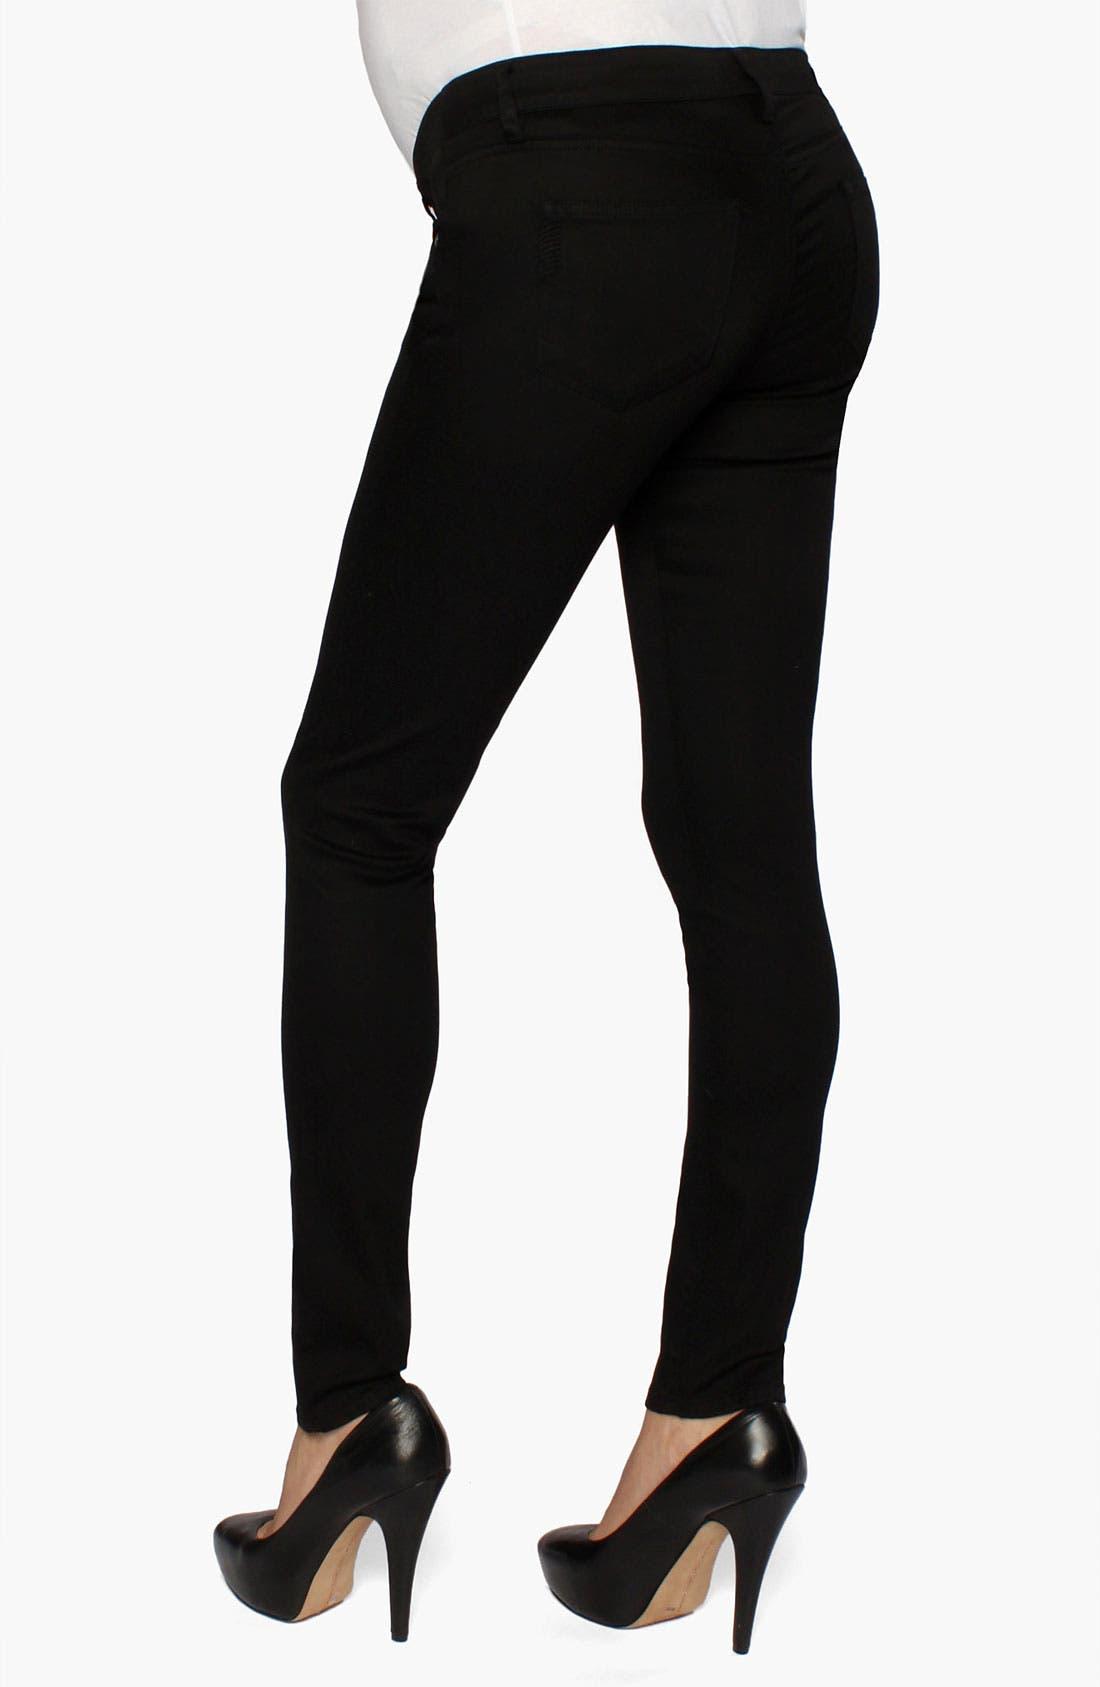 Denim 'Verdugo' Maternity Ultra Skinny Jeans,                             Main thumbnail 1, color,                             001